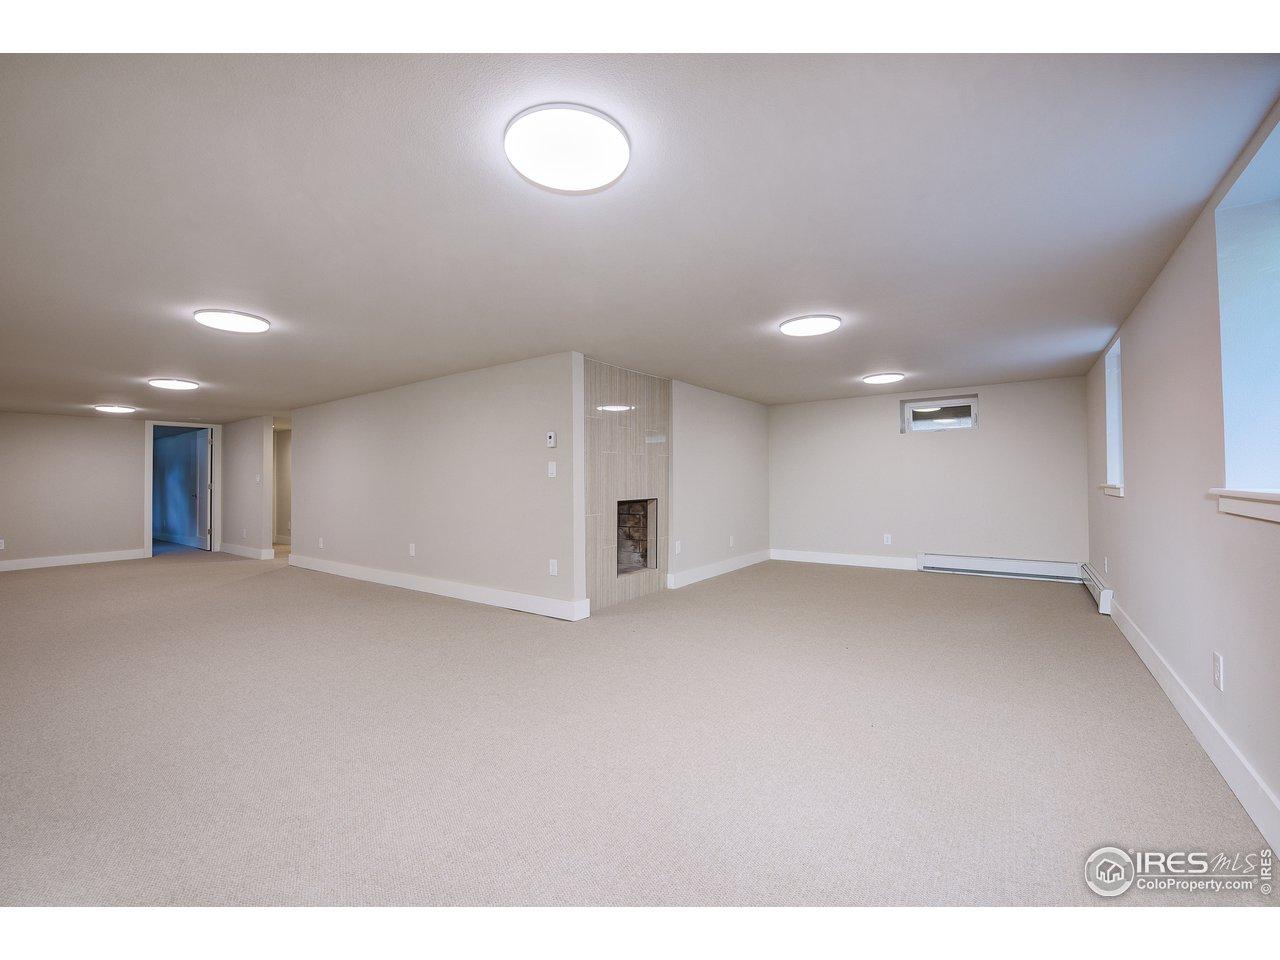 Huge rec-room/family room